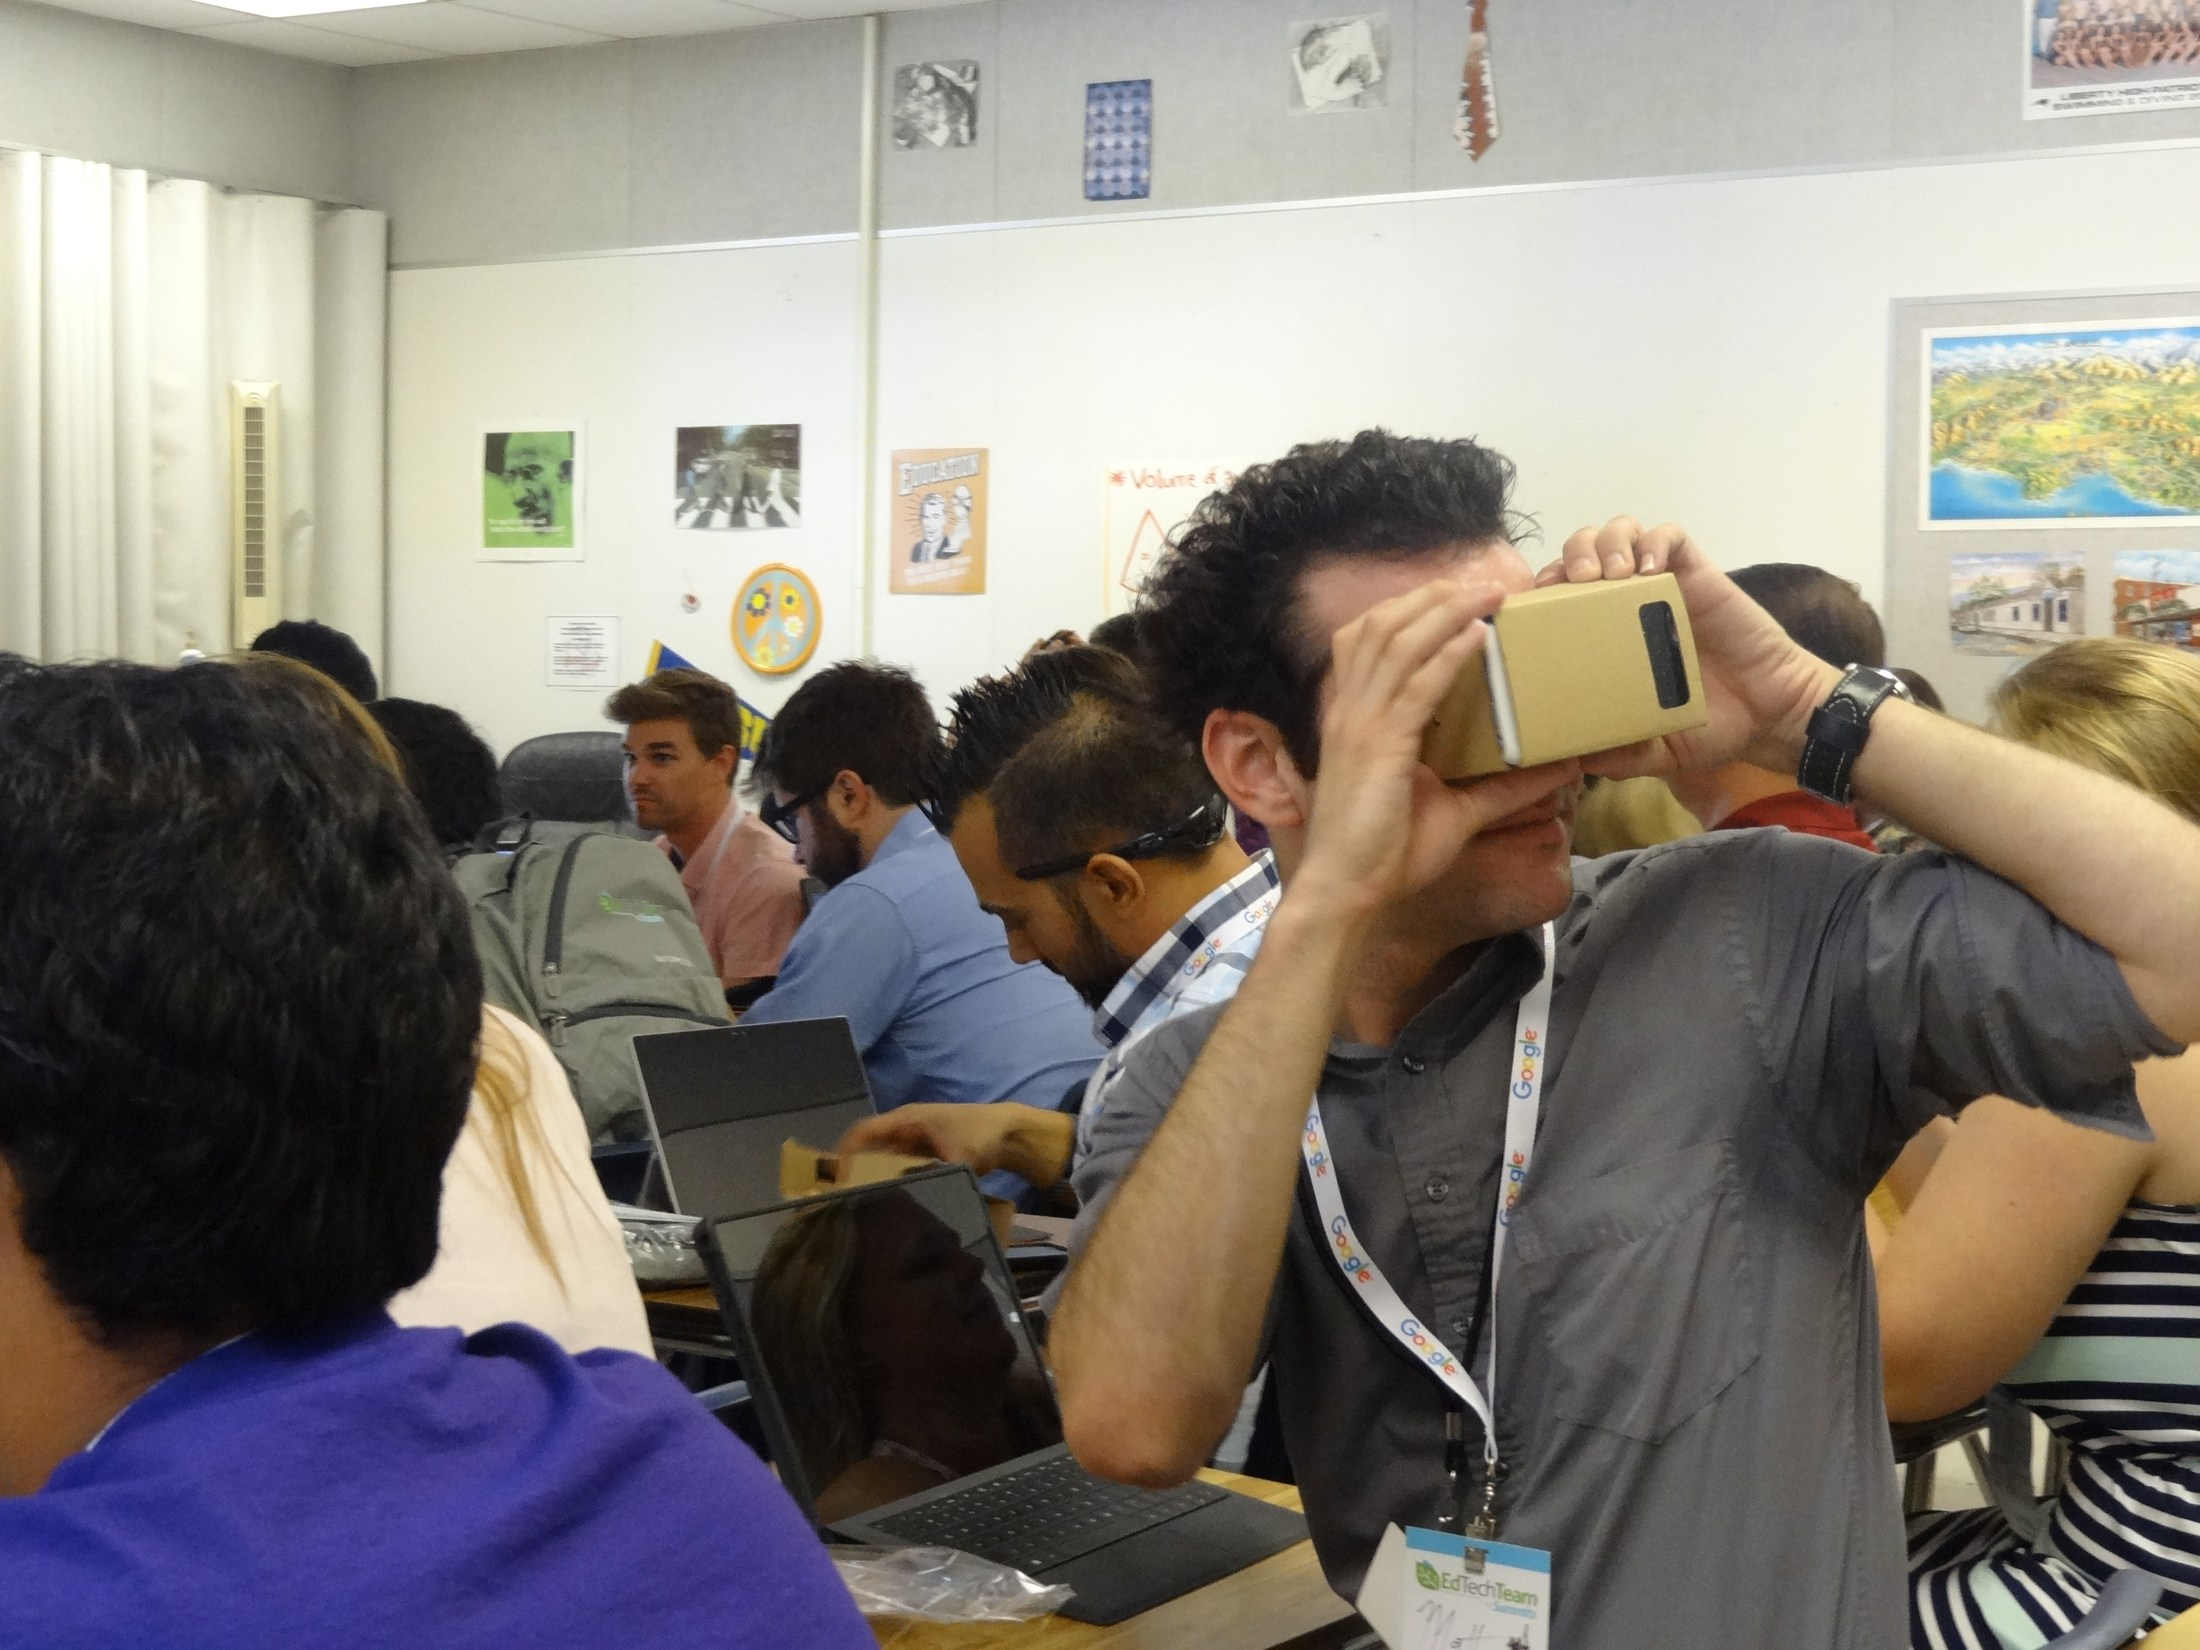 Google Cardboard Training